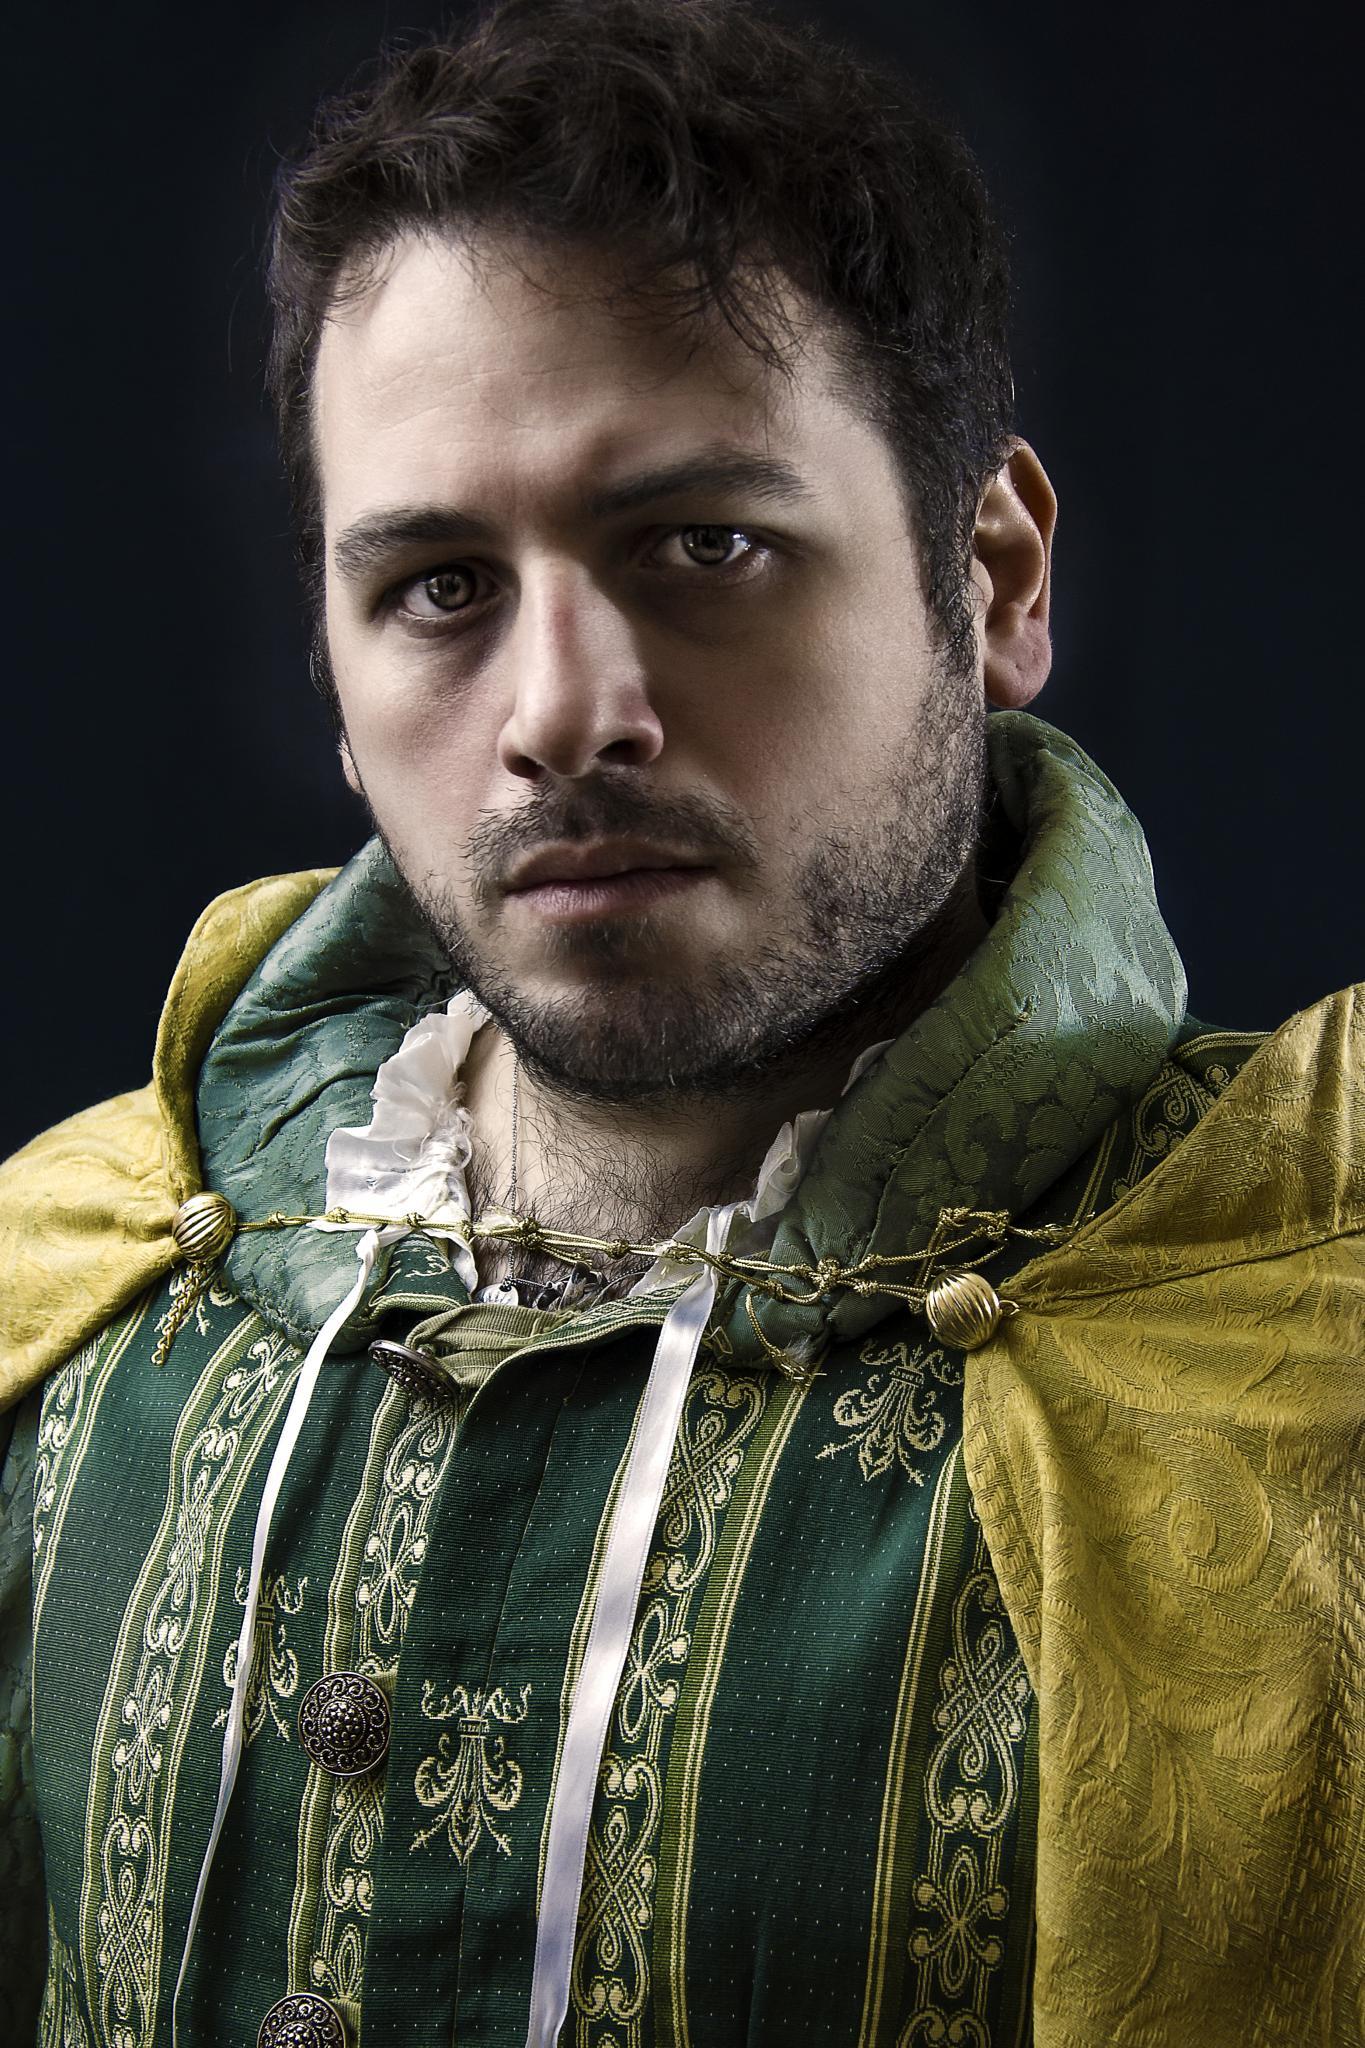 Uomo d'altri tempi self portrait by romeoinside